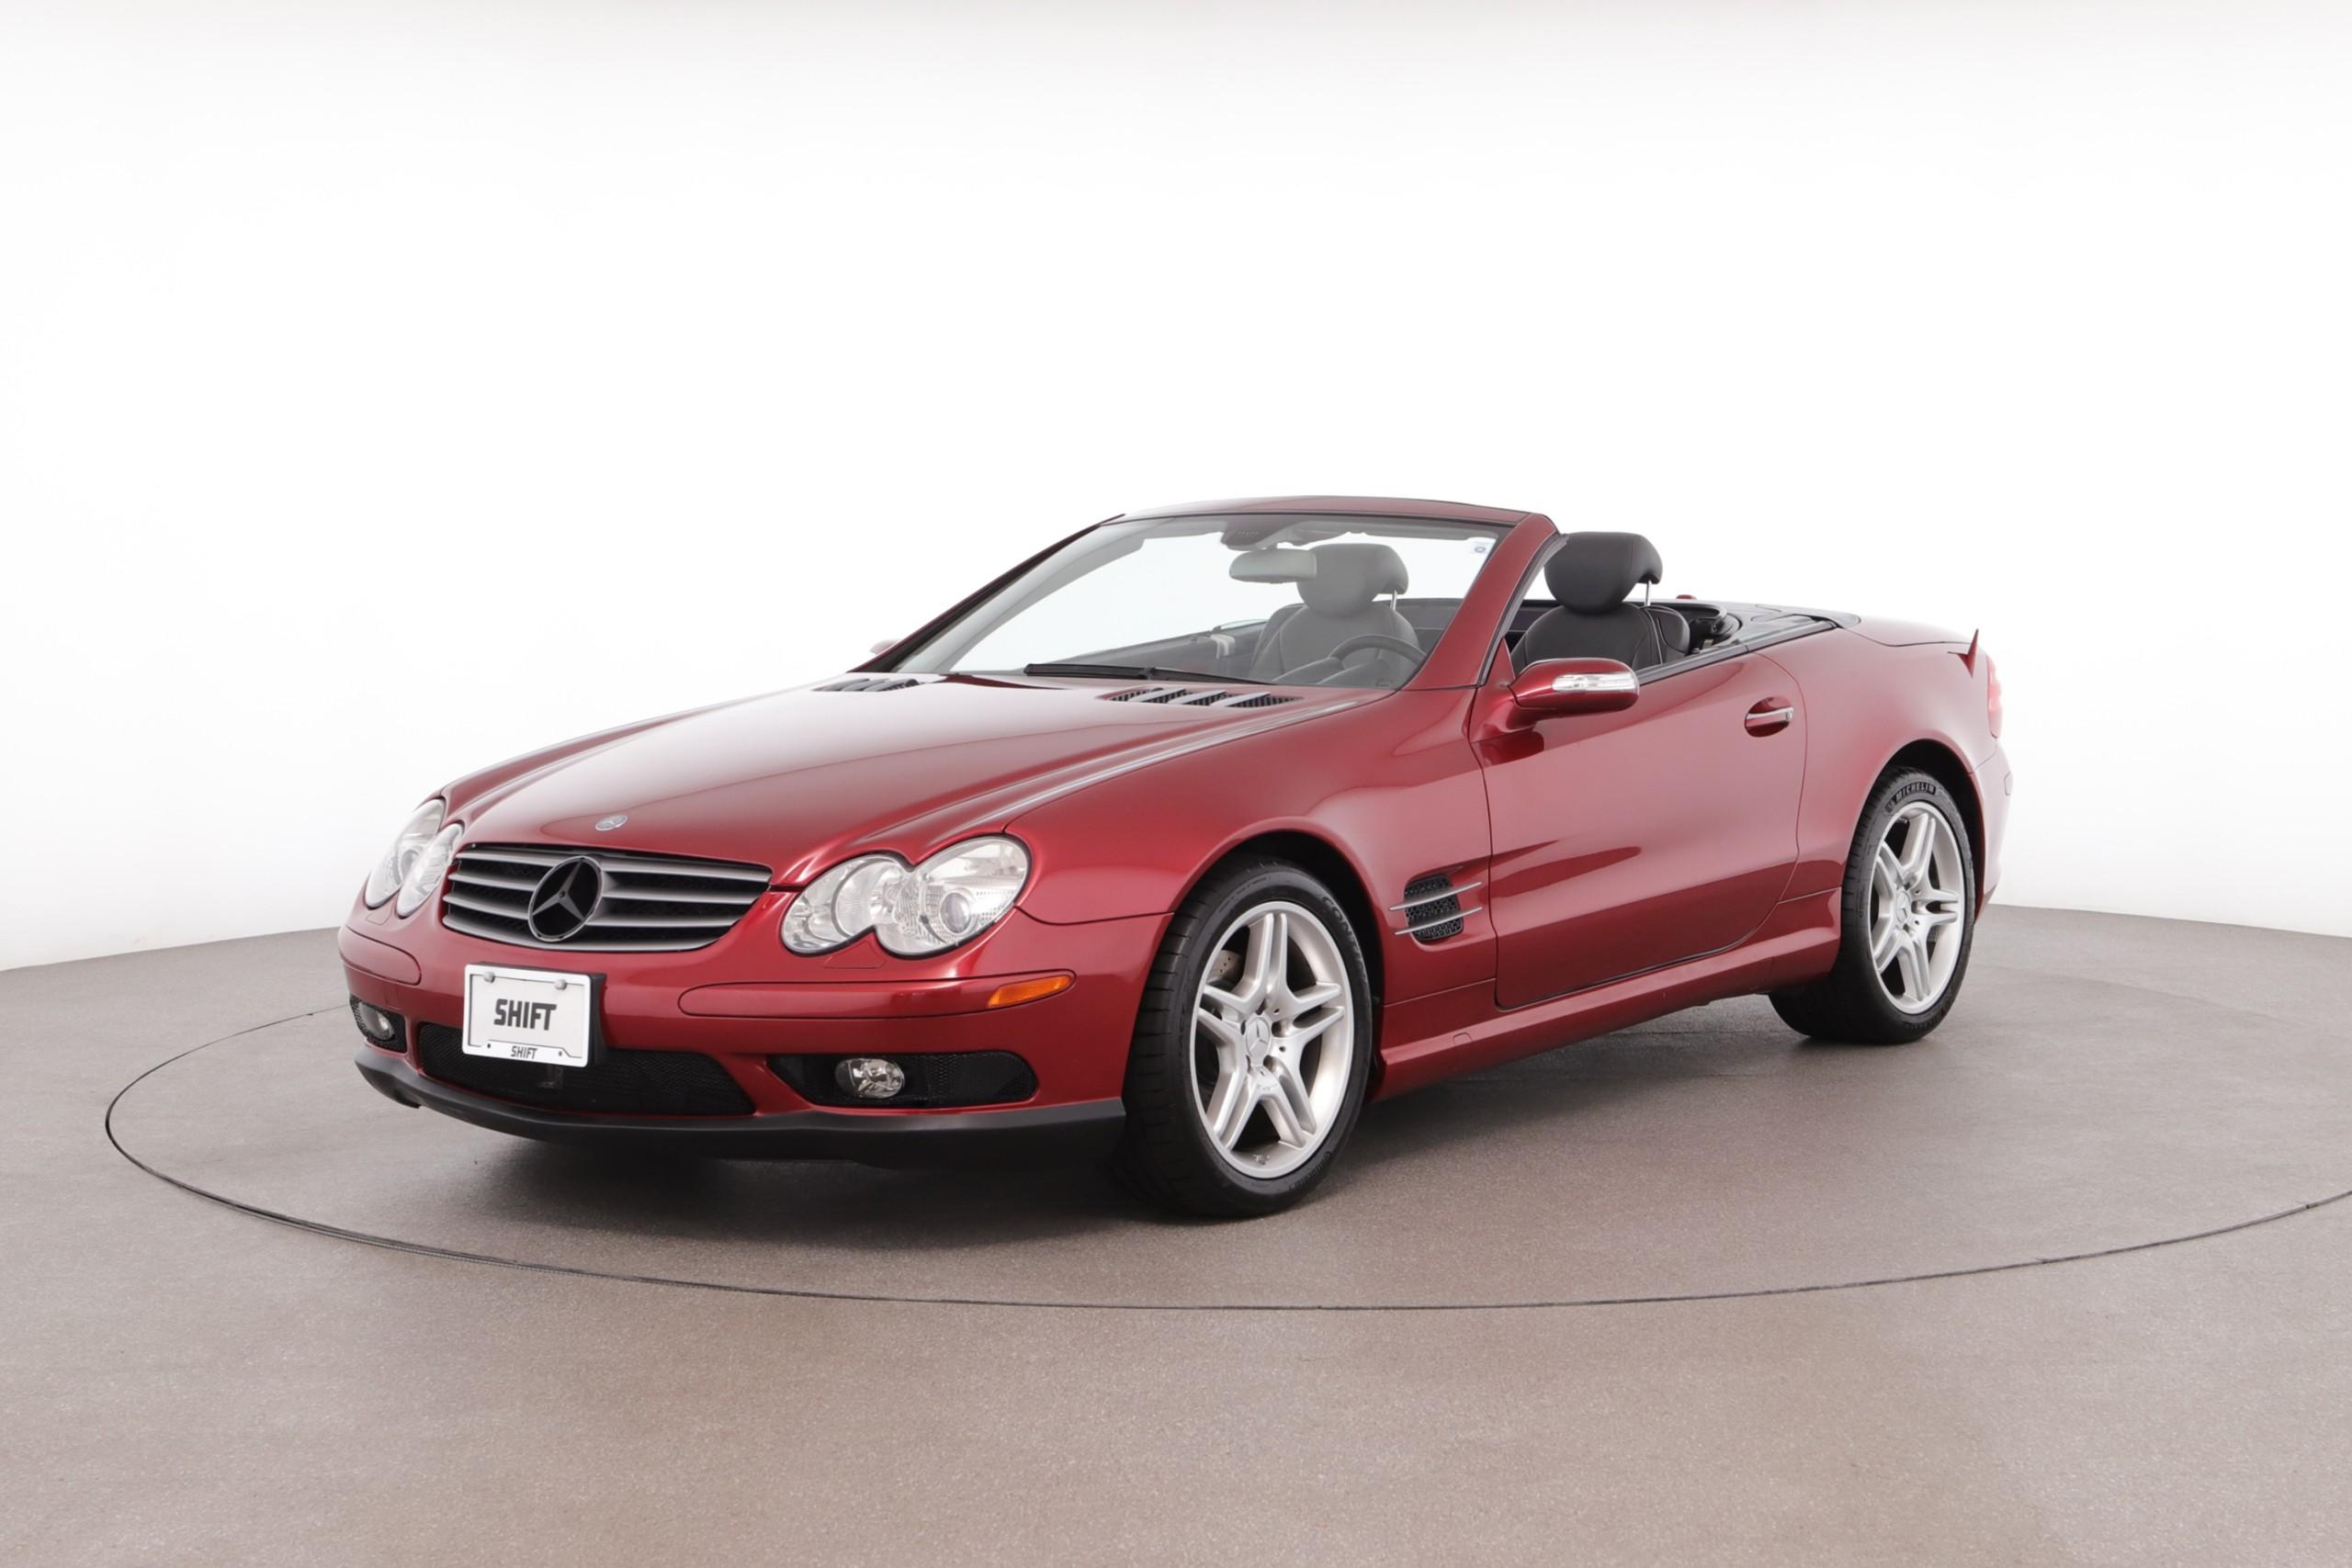 5. Mercedes-Benz